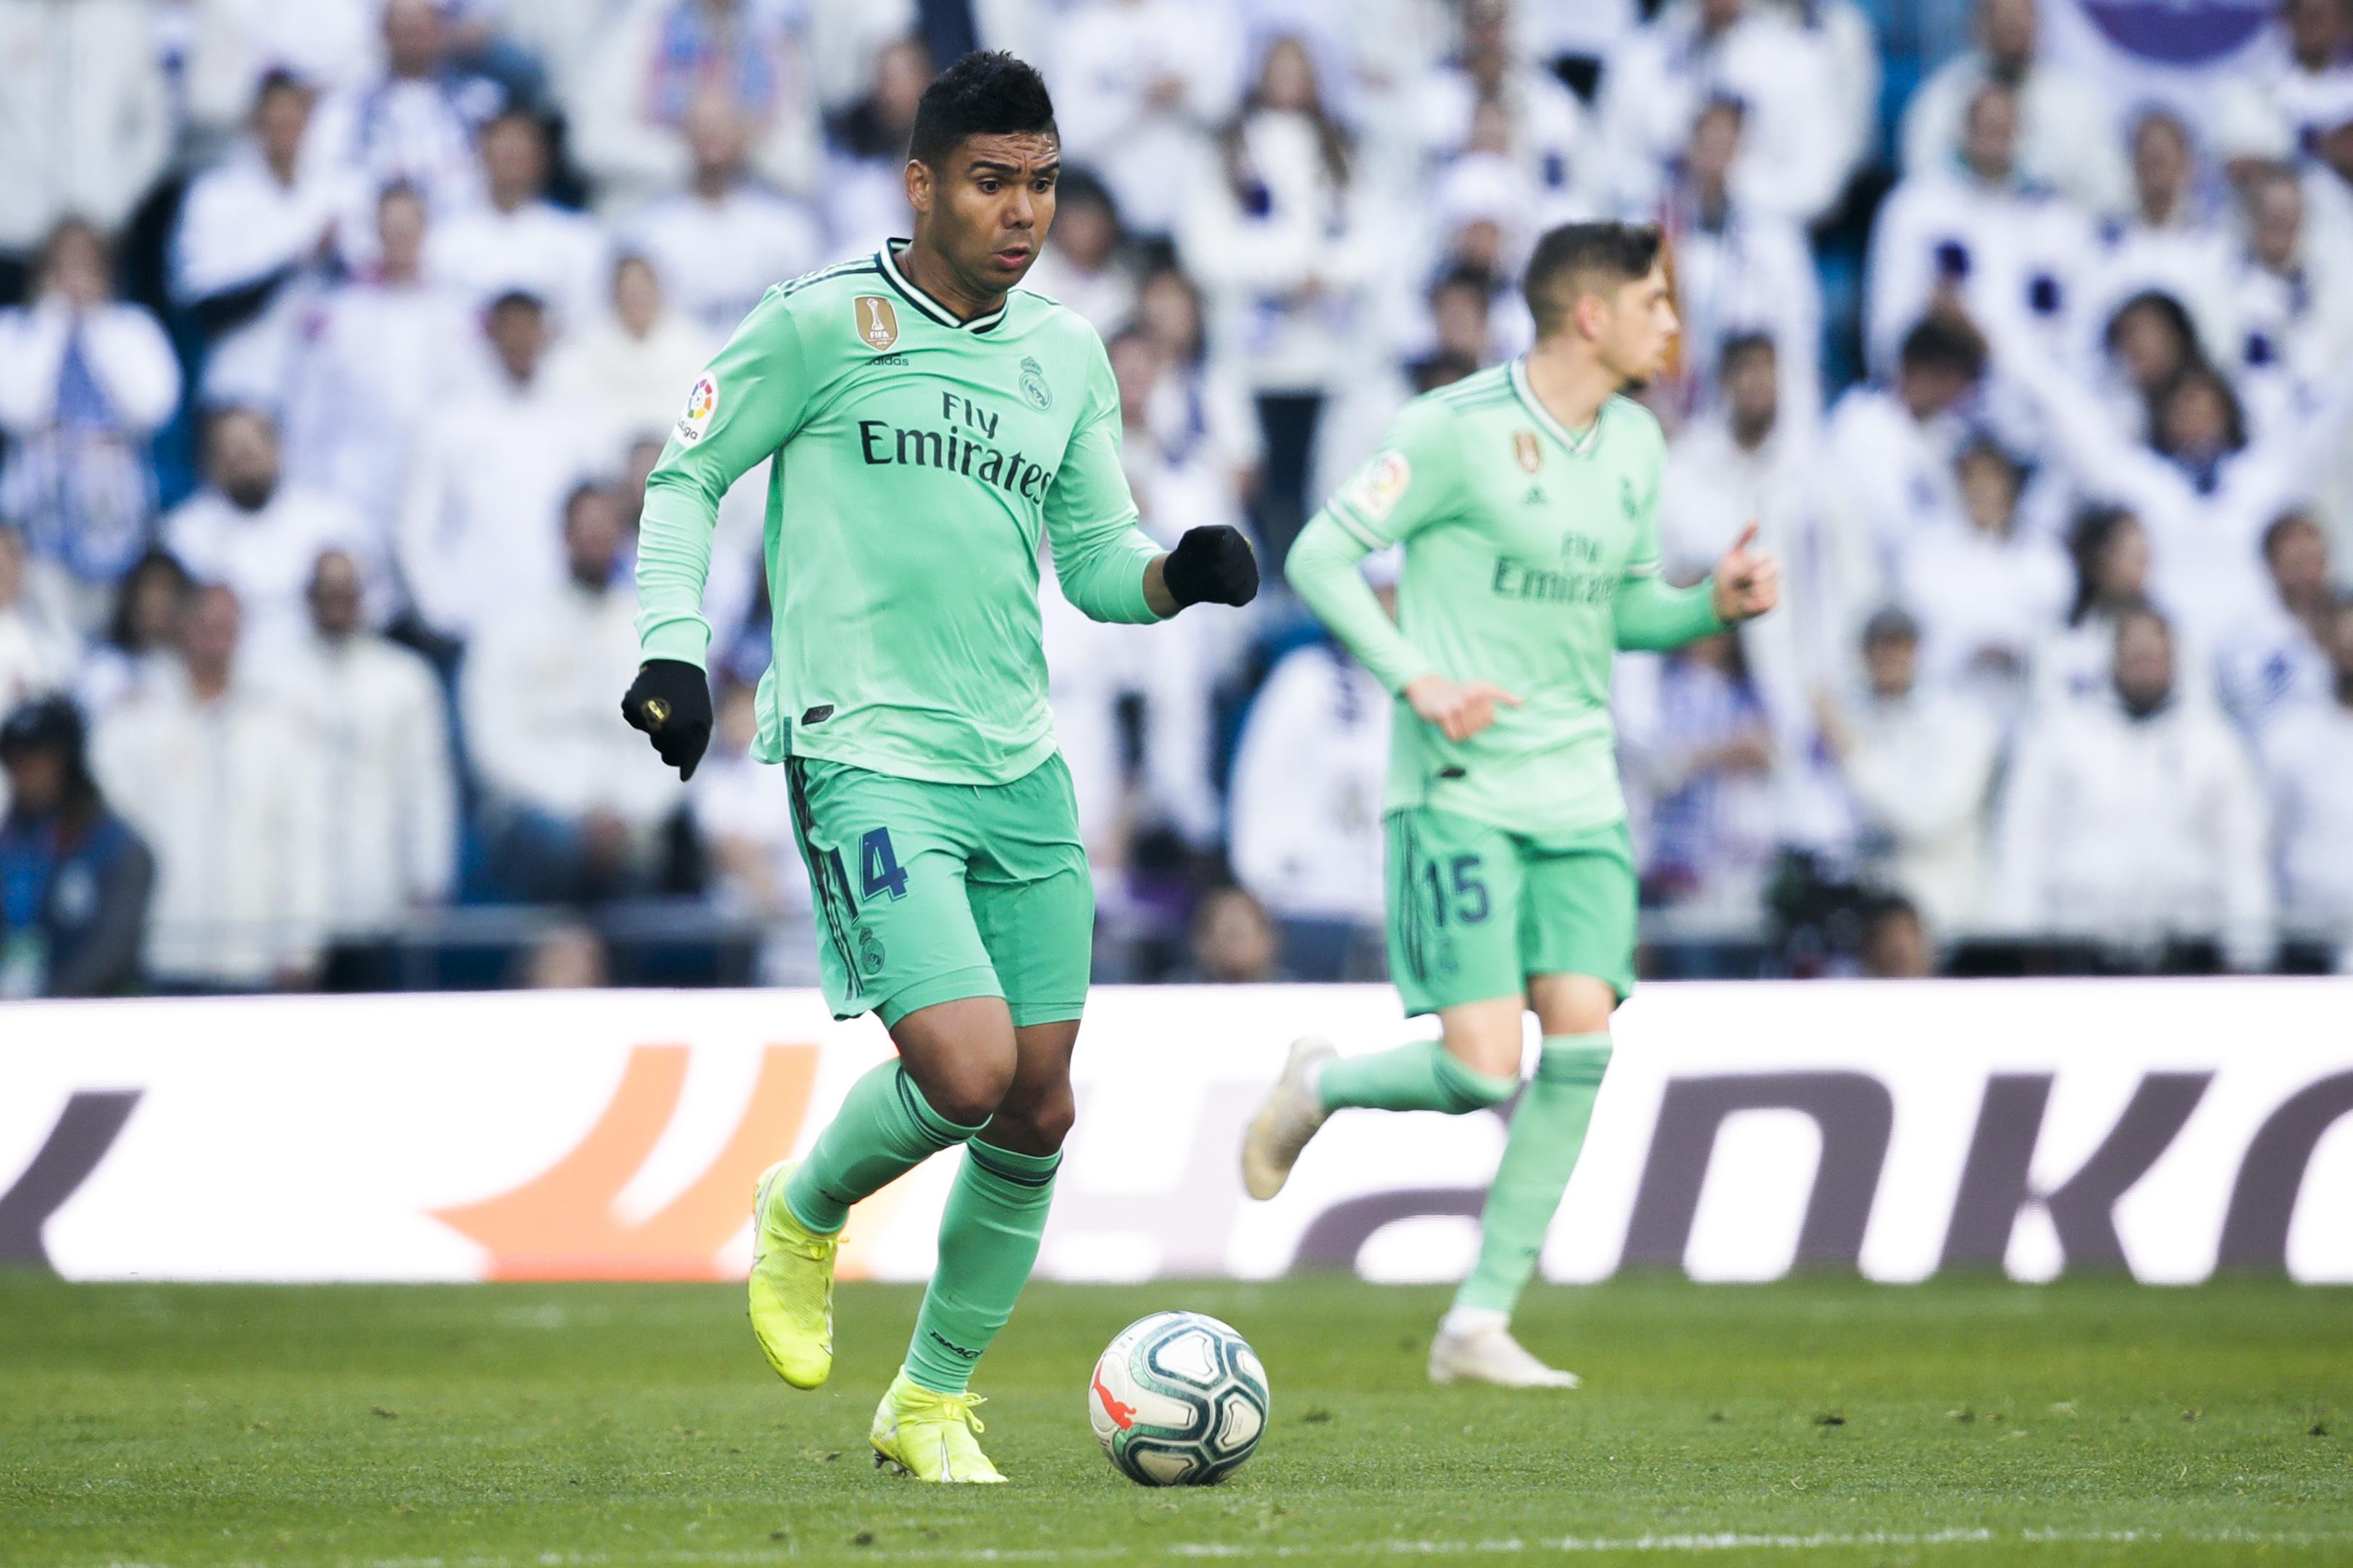 Real Madrid v Espanyol - La Liga Santander